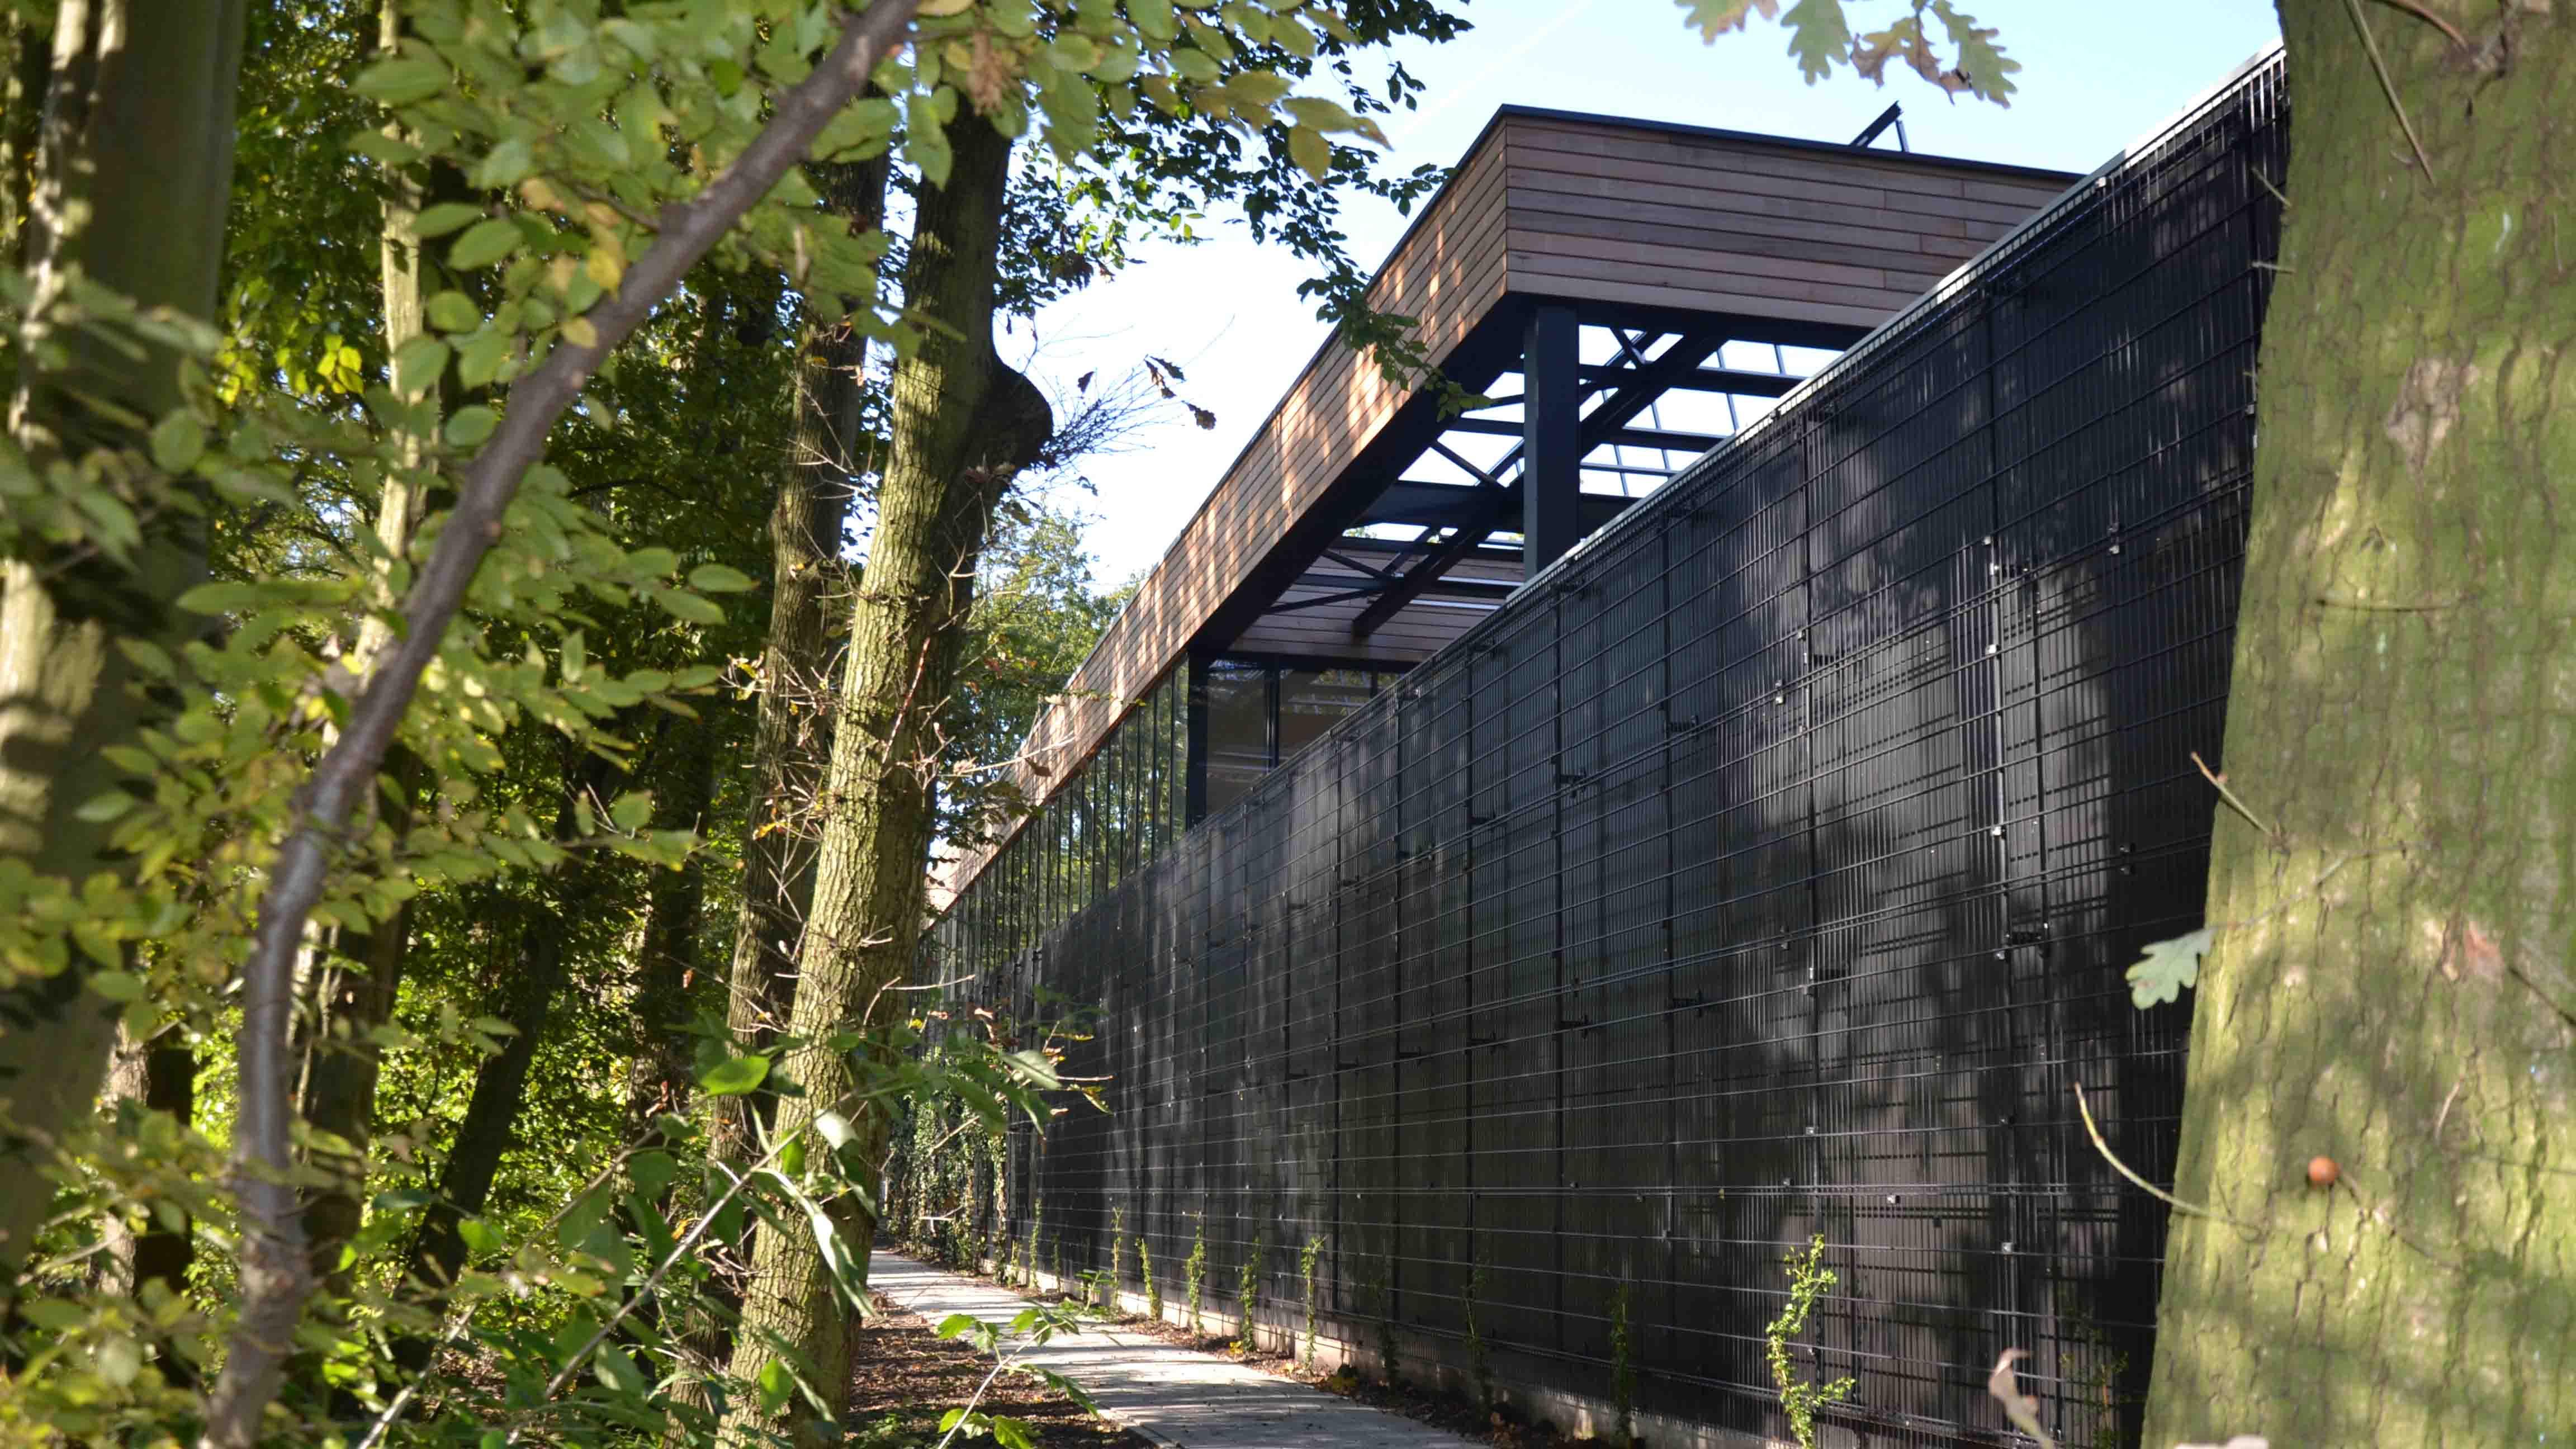 gemeentewerf charlois rotterdam architect marja haring